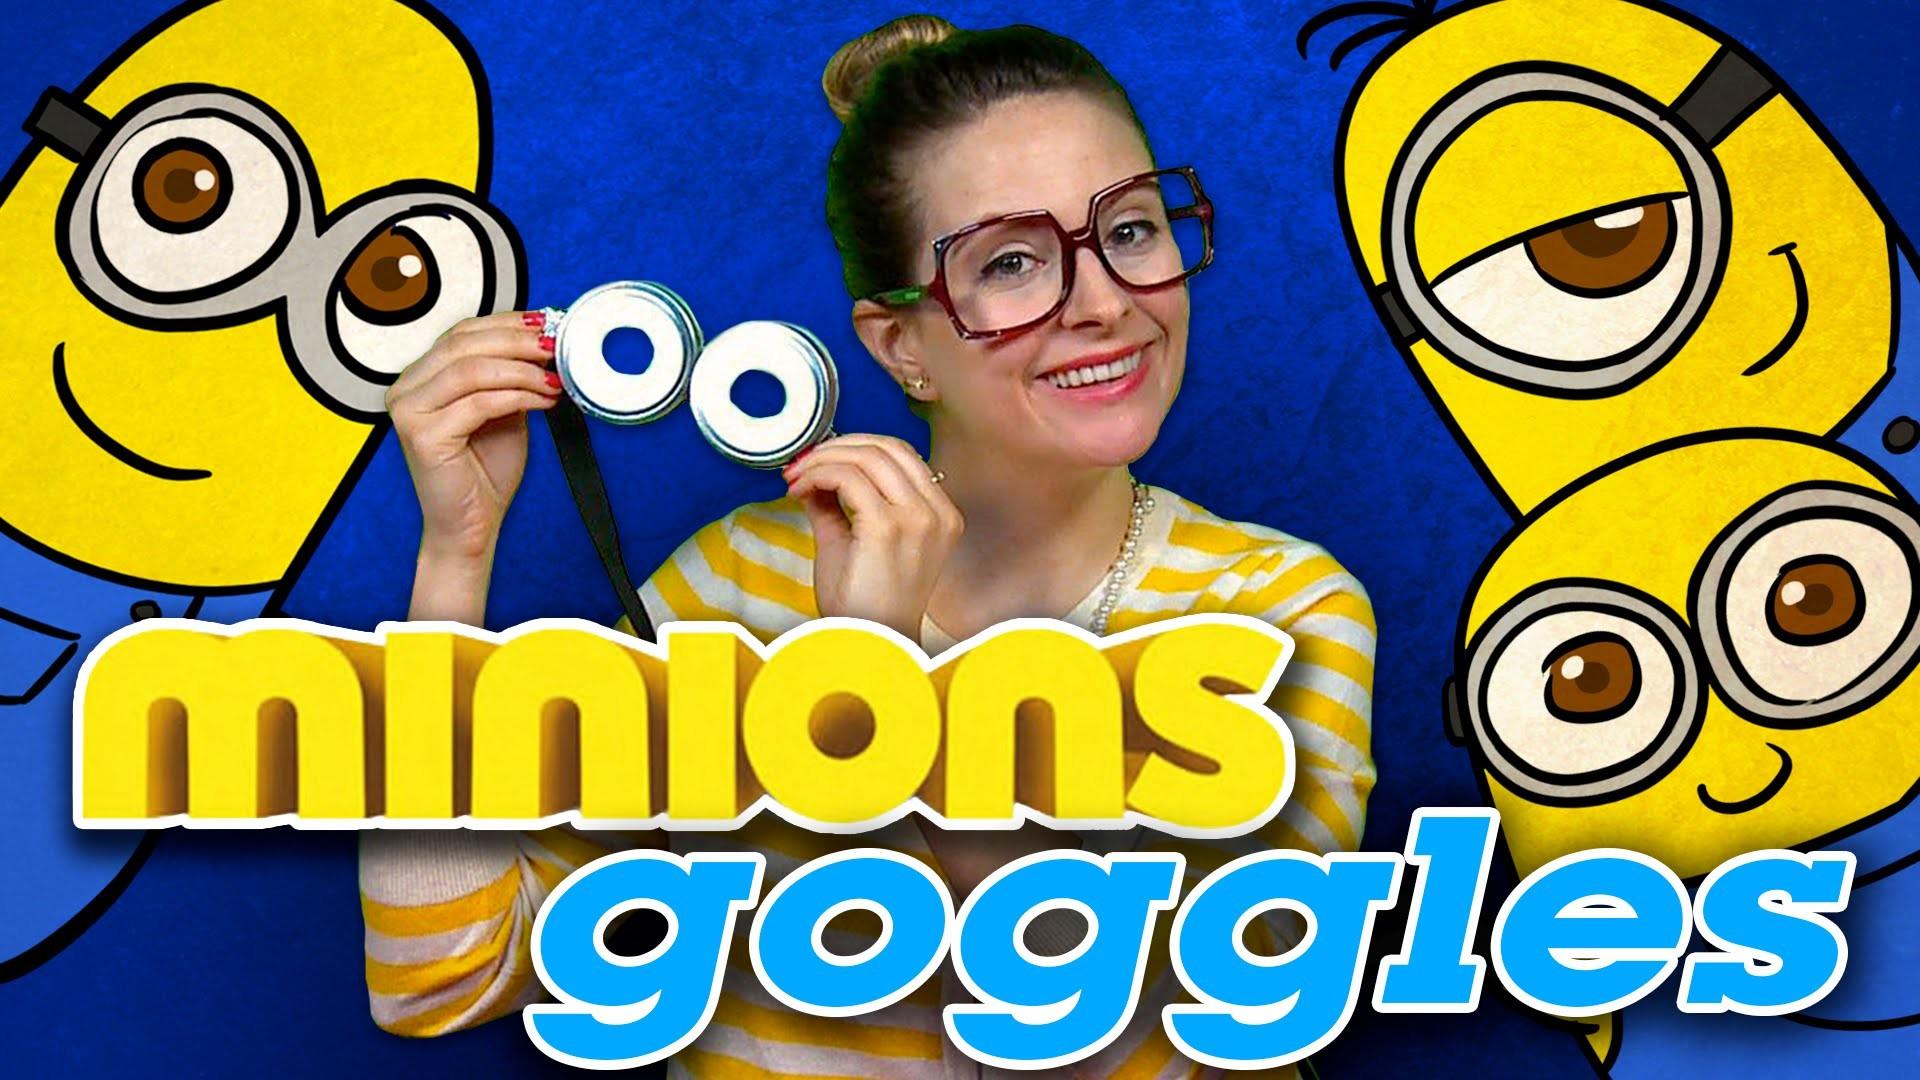 DIY Minions Goggles - Minions Crafts | Cool School Crafts with Crafty Carol